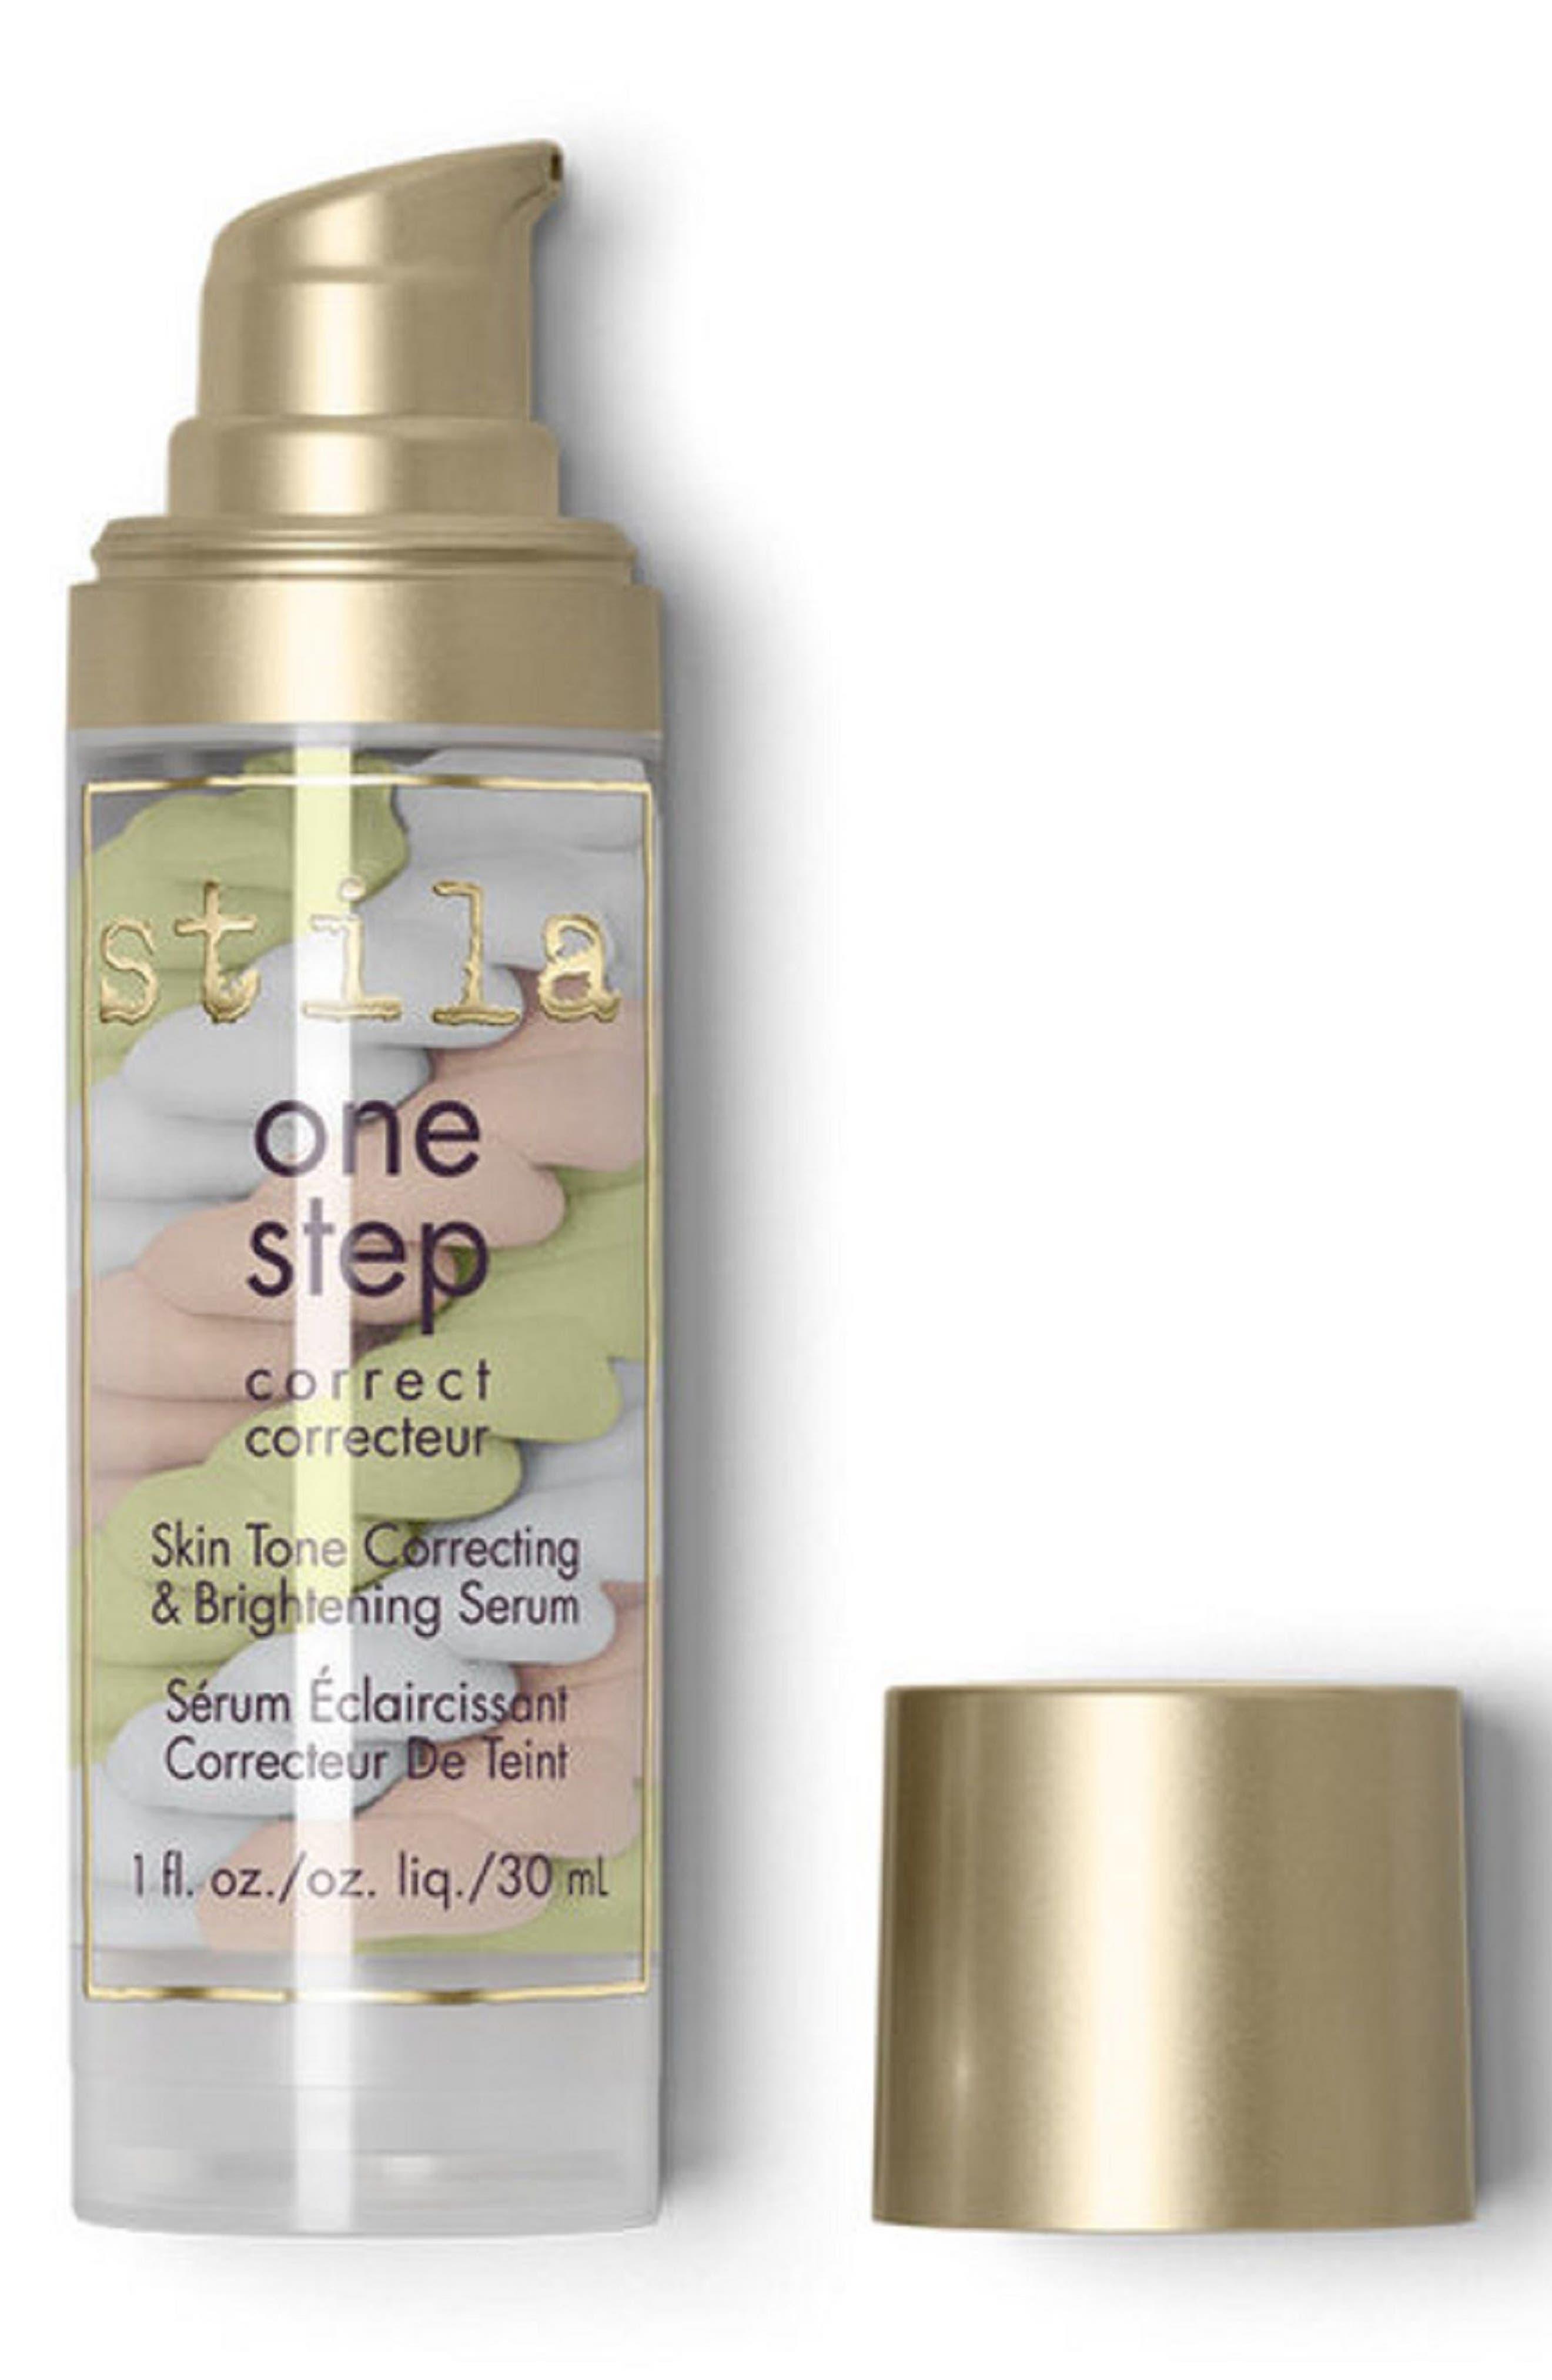 STILA, One Step Correct Skin Tone Correcting Brightening Serum, Alternate thumbnail 2, color, NO COLOR